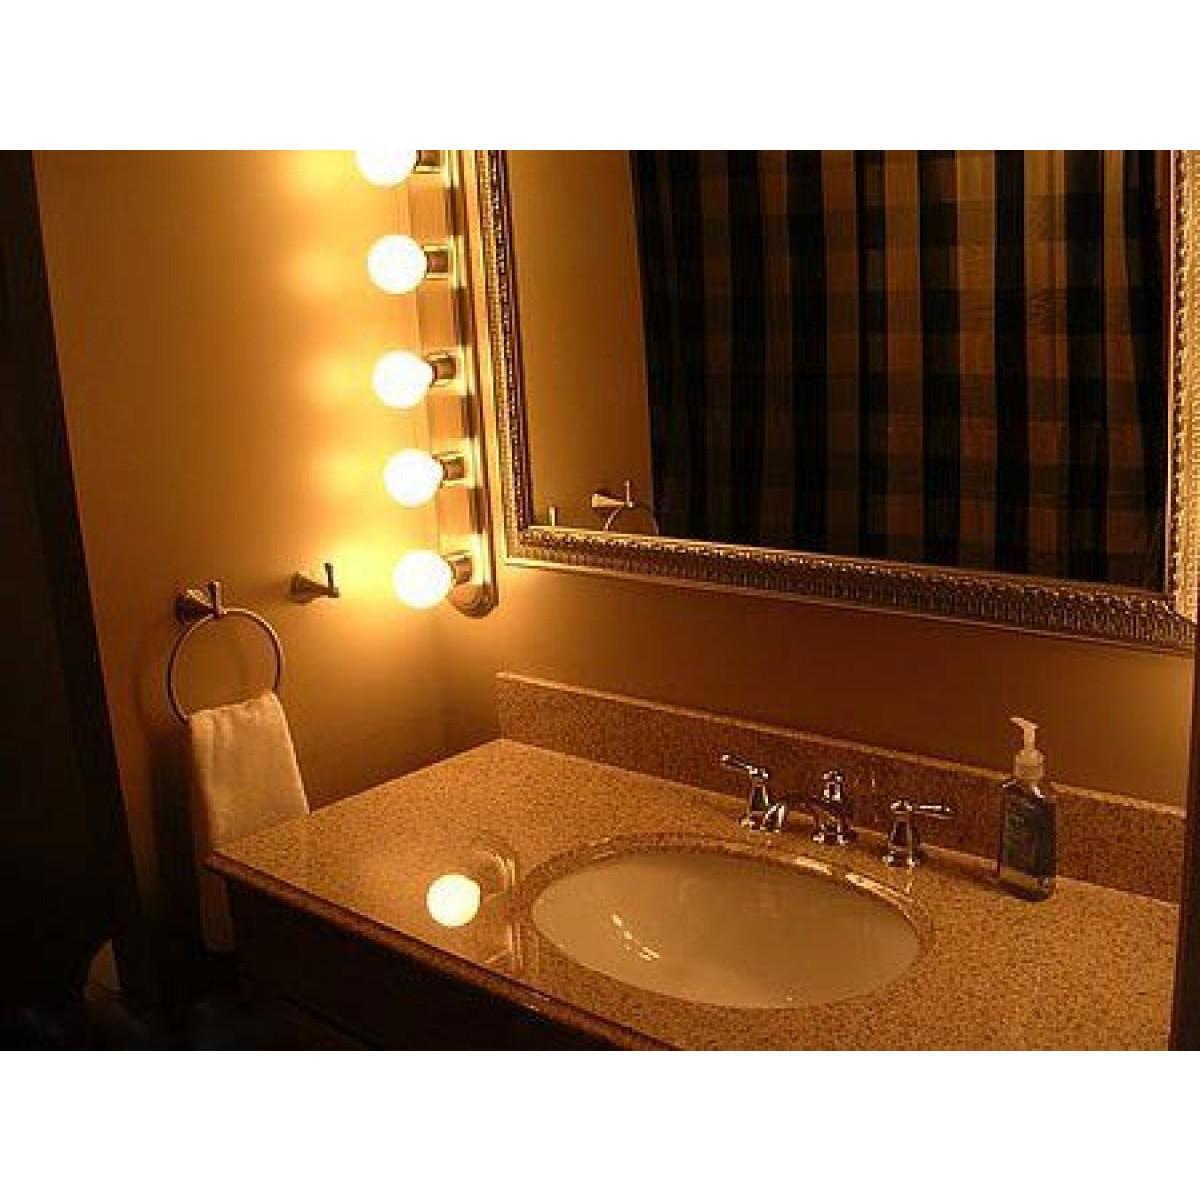 19 inch bathroom vanity